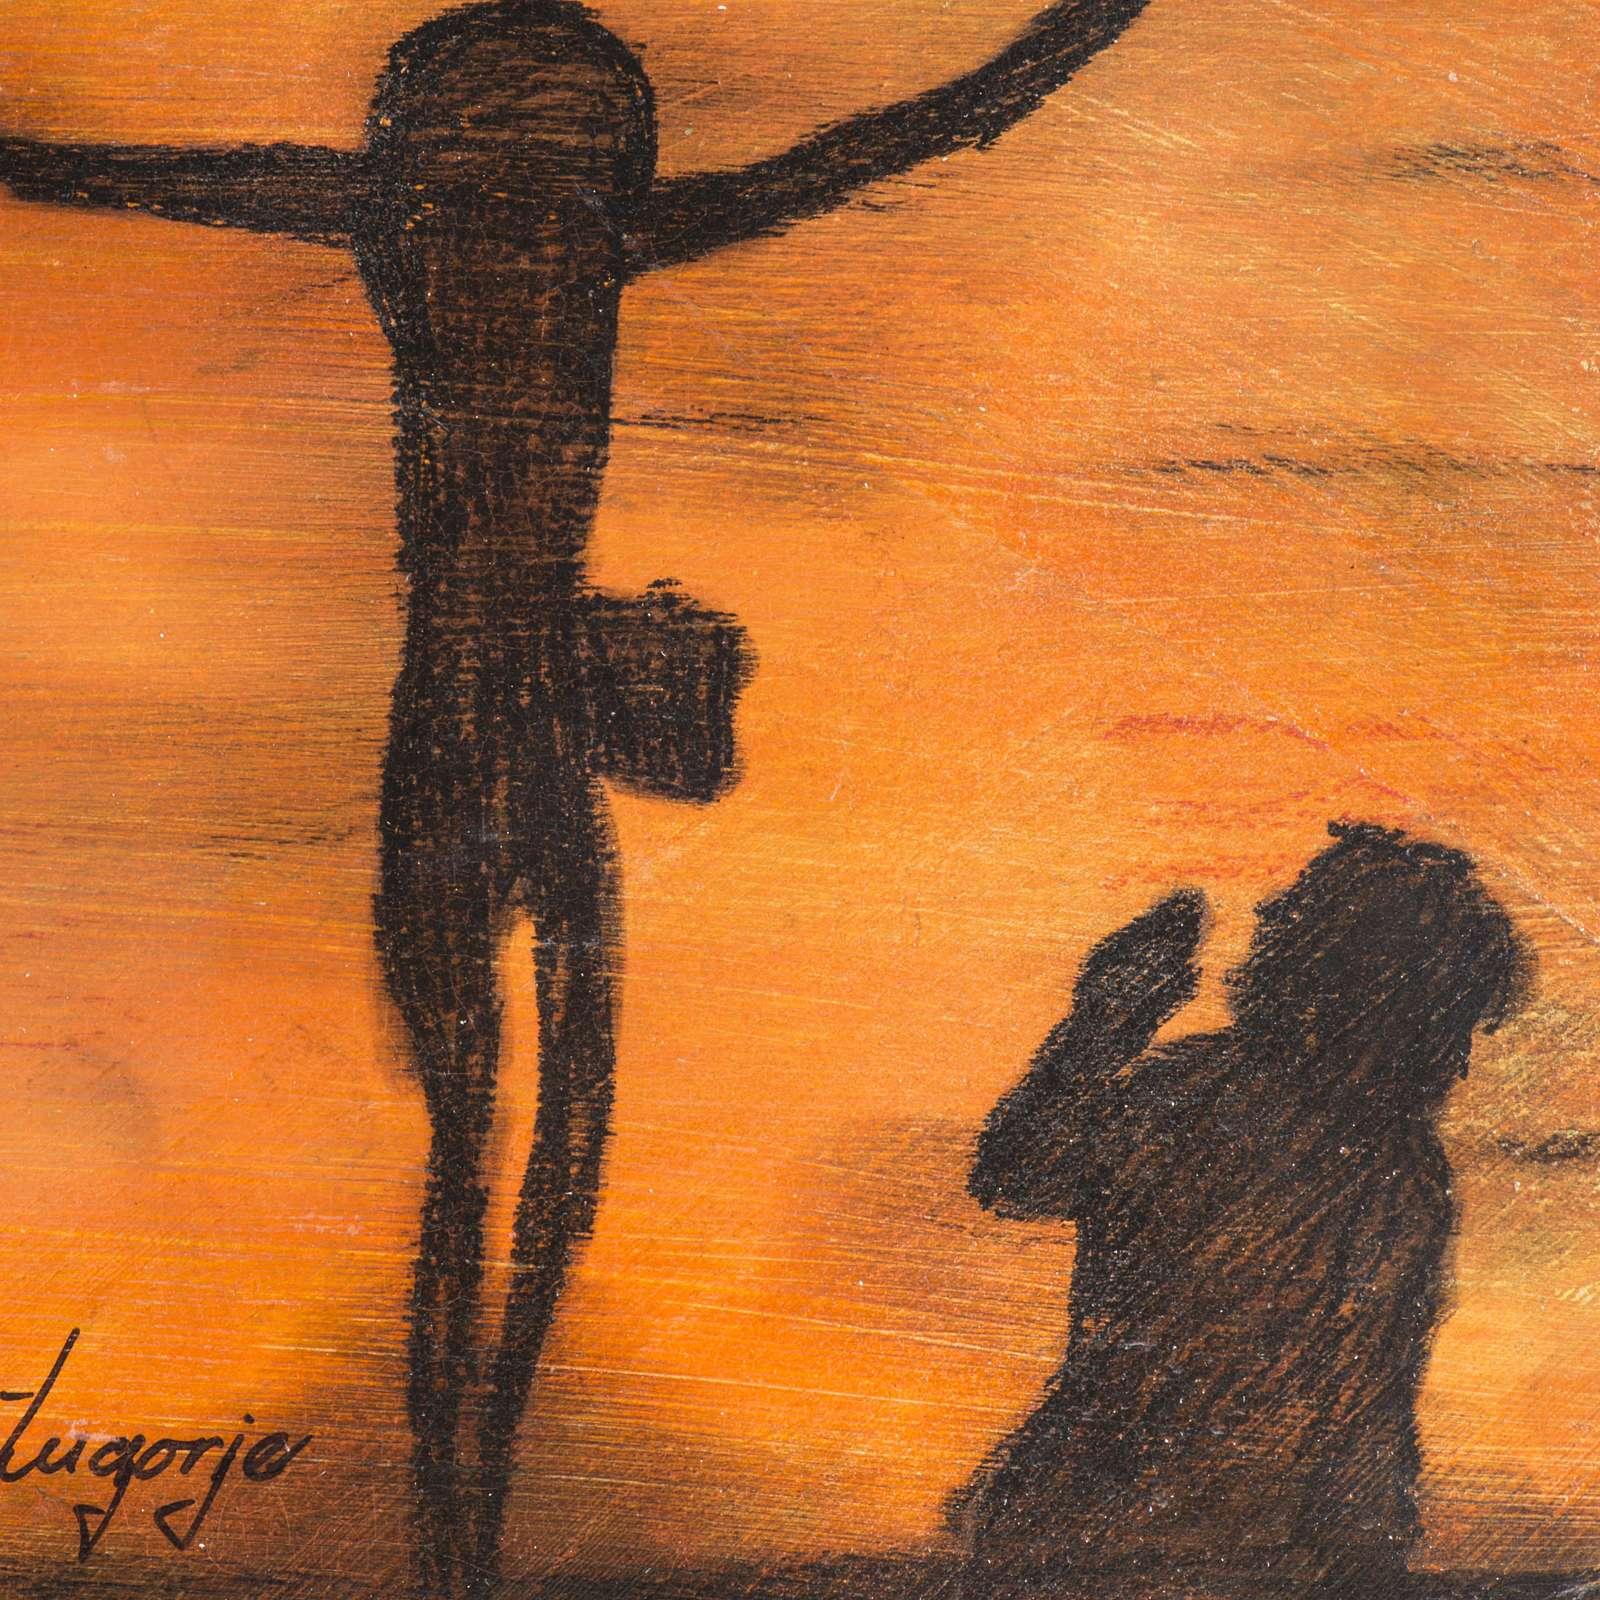 Benedizione Gesù Risorto Medjugorje 4